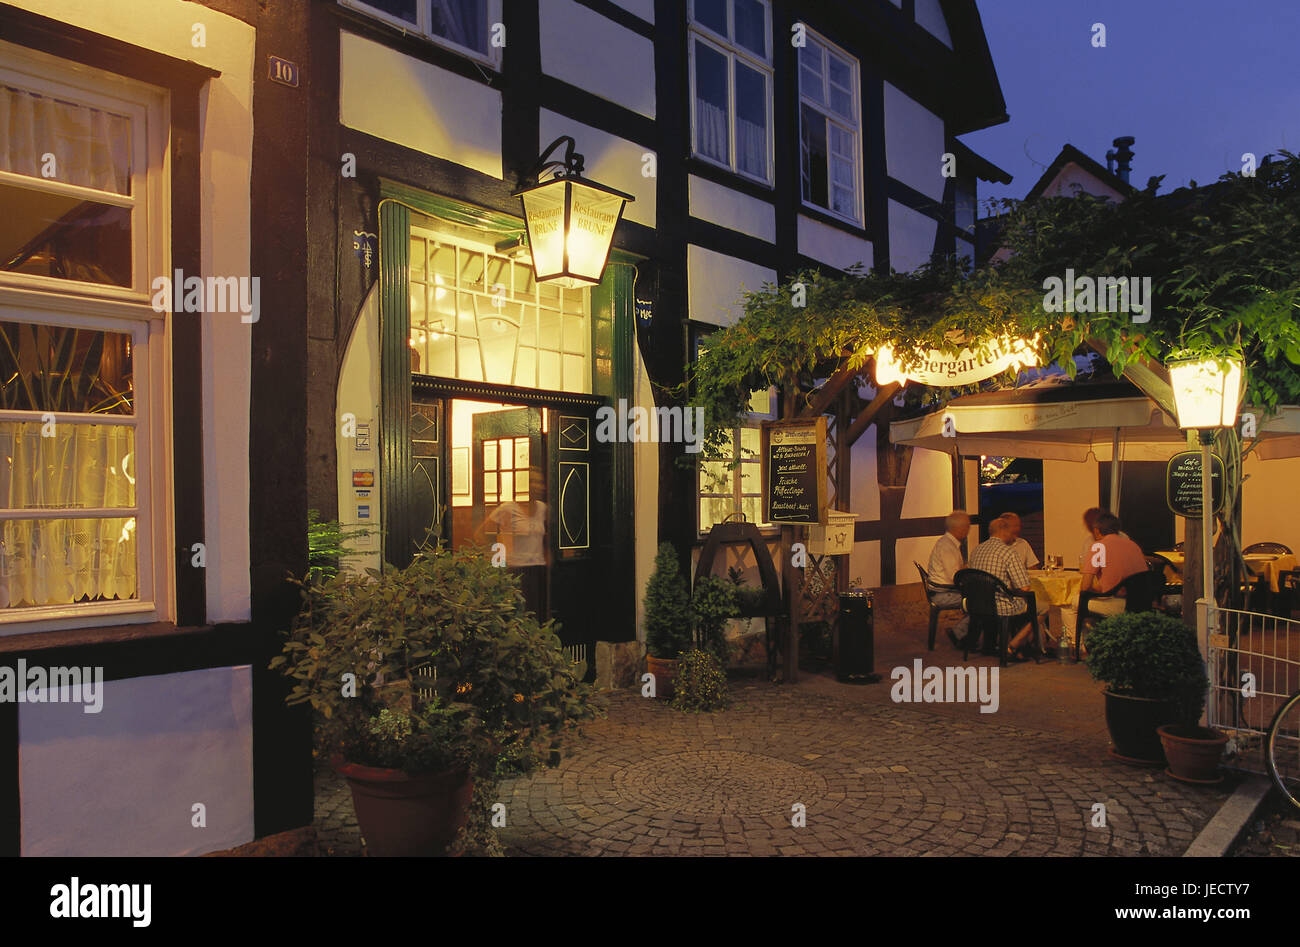 Germany, North Rhine-Westphalia, Halle, Old Town, restaurant, beer garden, evening, Westphalian, place of interest, - Stock Image